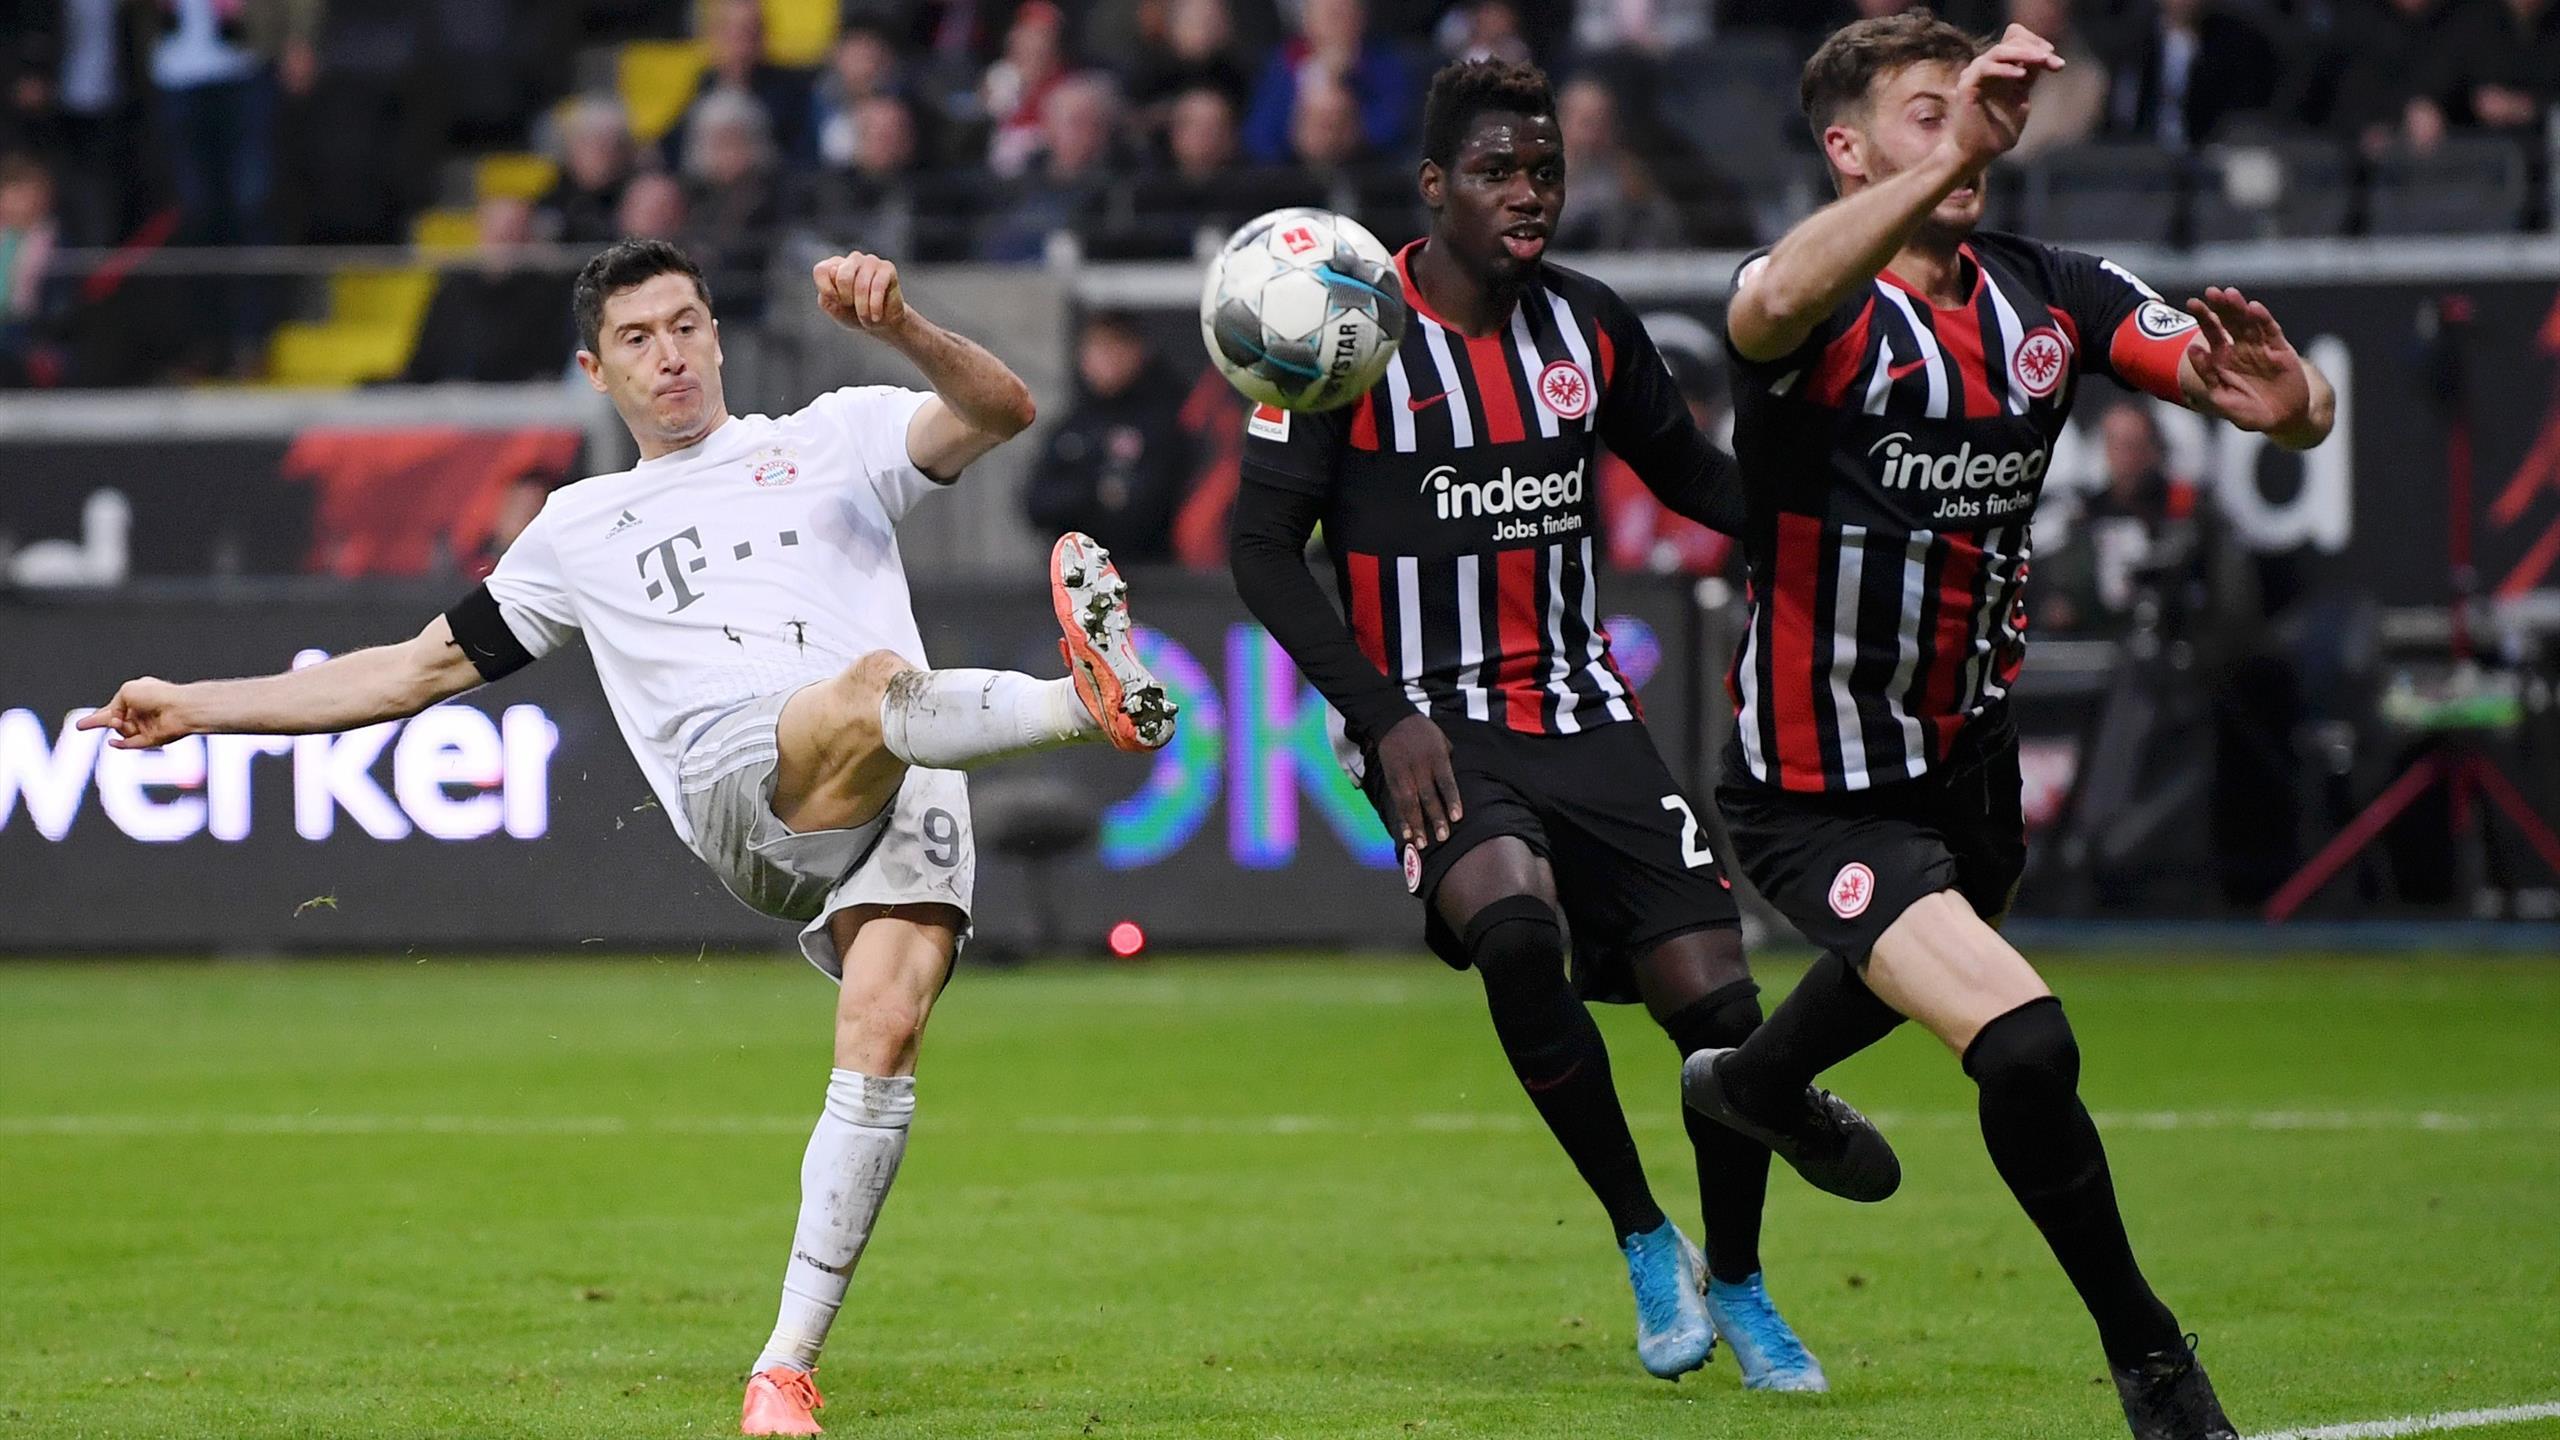 Dfb Pokal Halbfinale Bayern Gegen Frankfurt